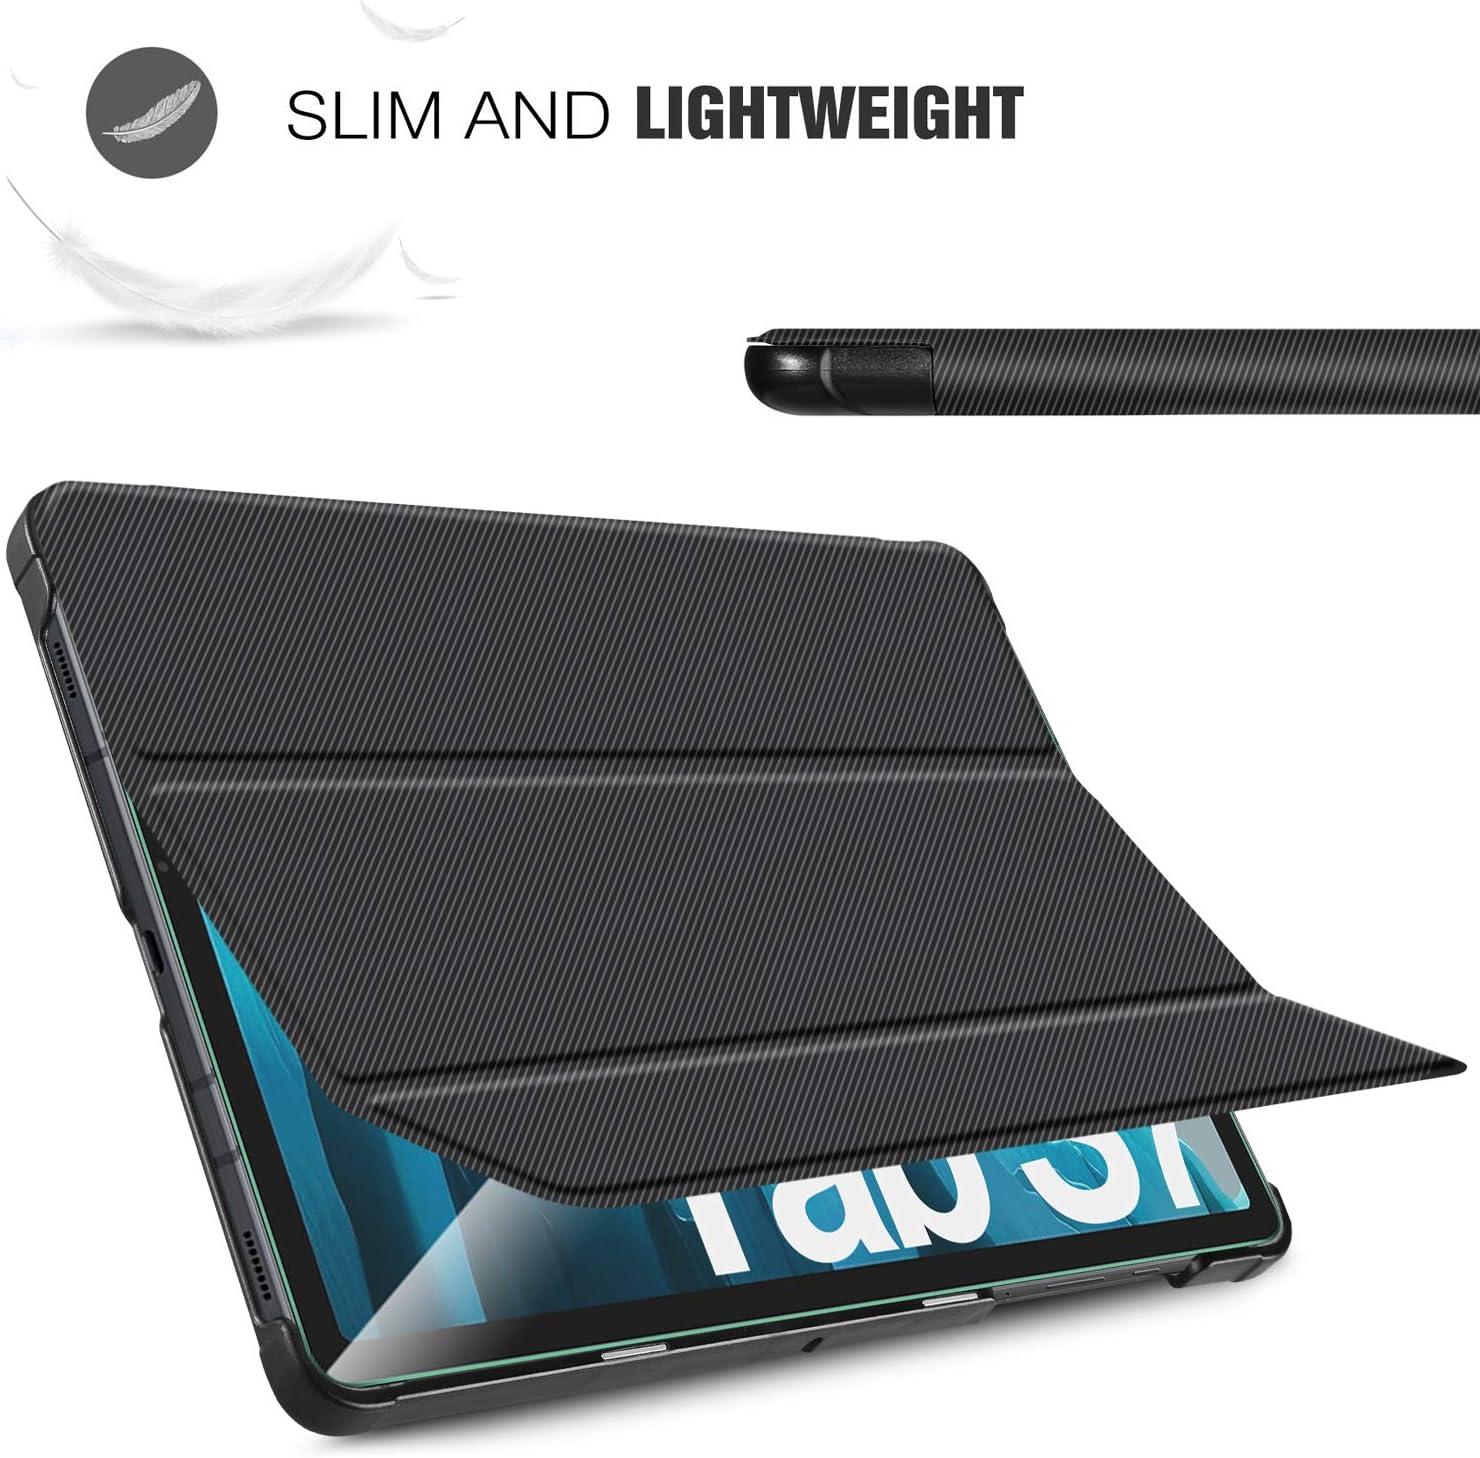 ELTD pour Samsung Galaxy Tab S7 Verre Tremp/é Film+ pour Samsung Galaxy Tab S7 Coque Etui Cover Housse Etui Coque SM-T870//875 , Noir + 1 Pack Verre Tremp/é Film pour Samsung Galaxy Tab S7 11